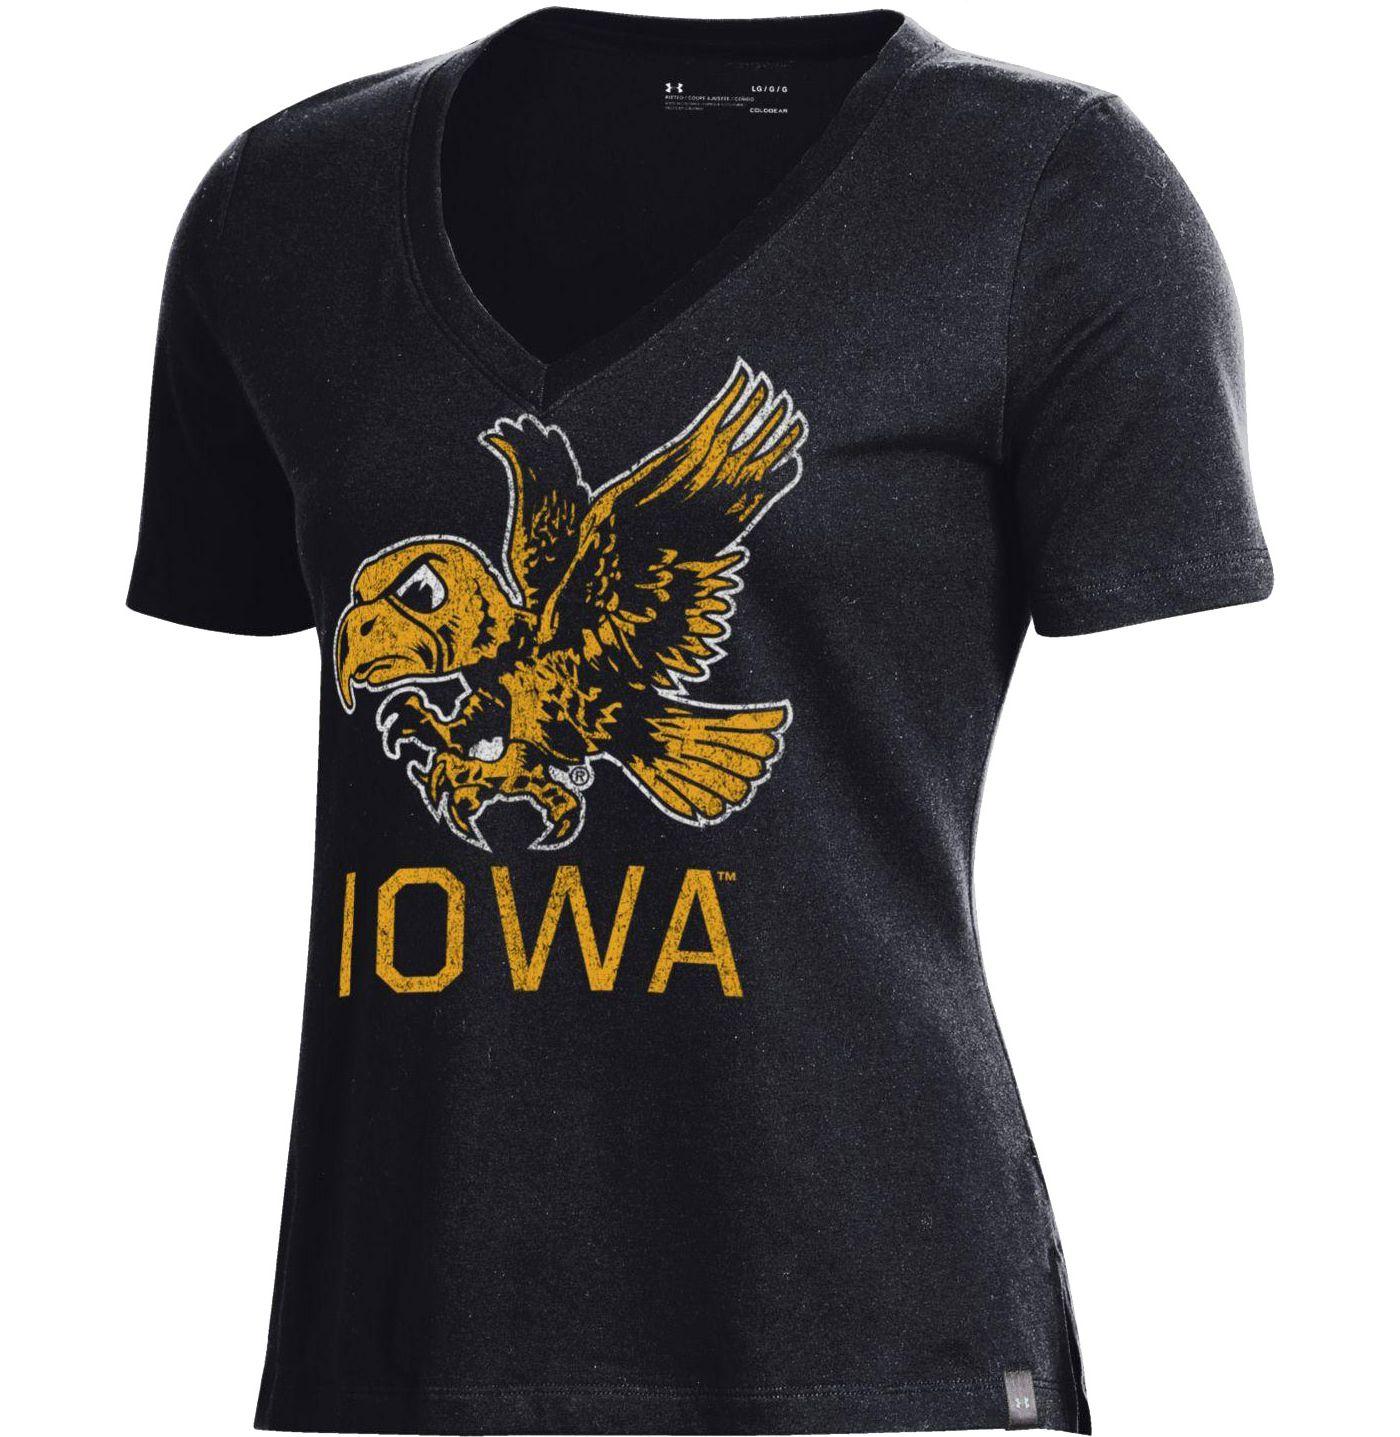 Under Armour Women's Iowa Hawkeyes Performance V-Neck Black T-Shirt